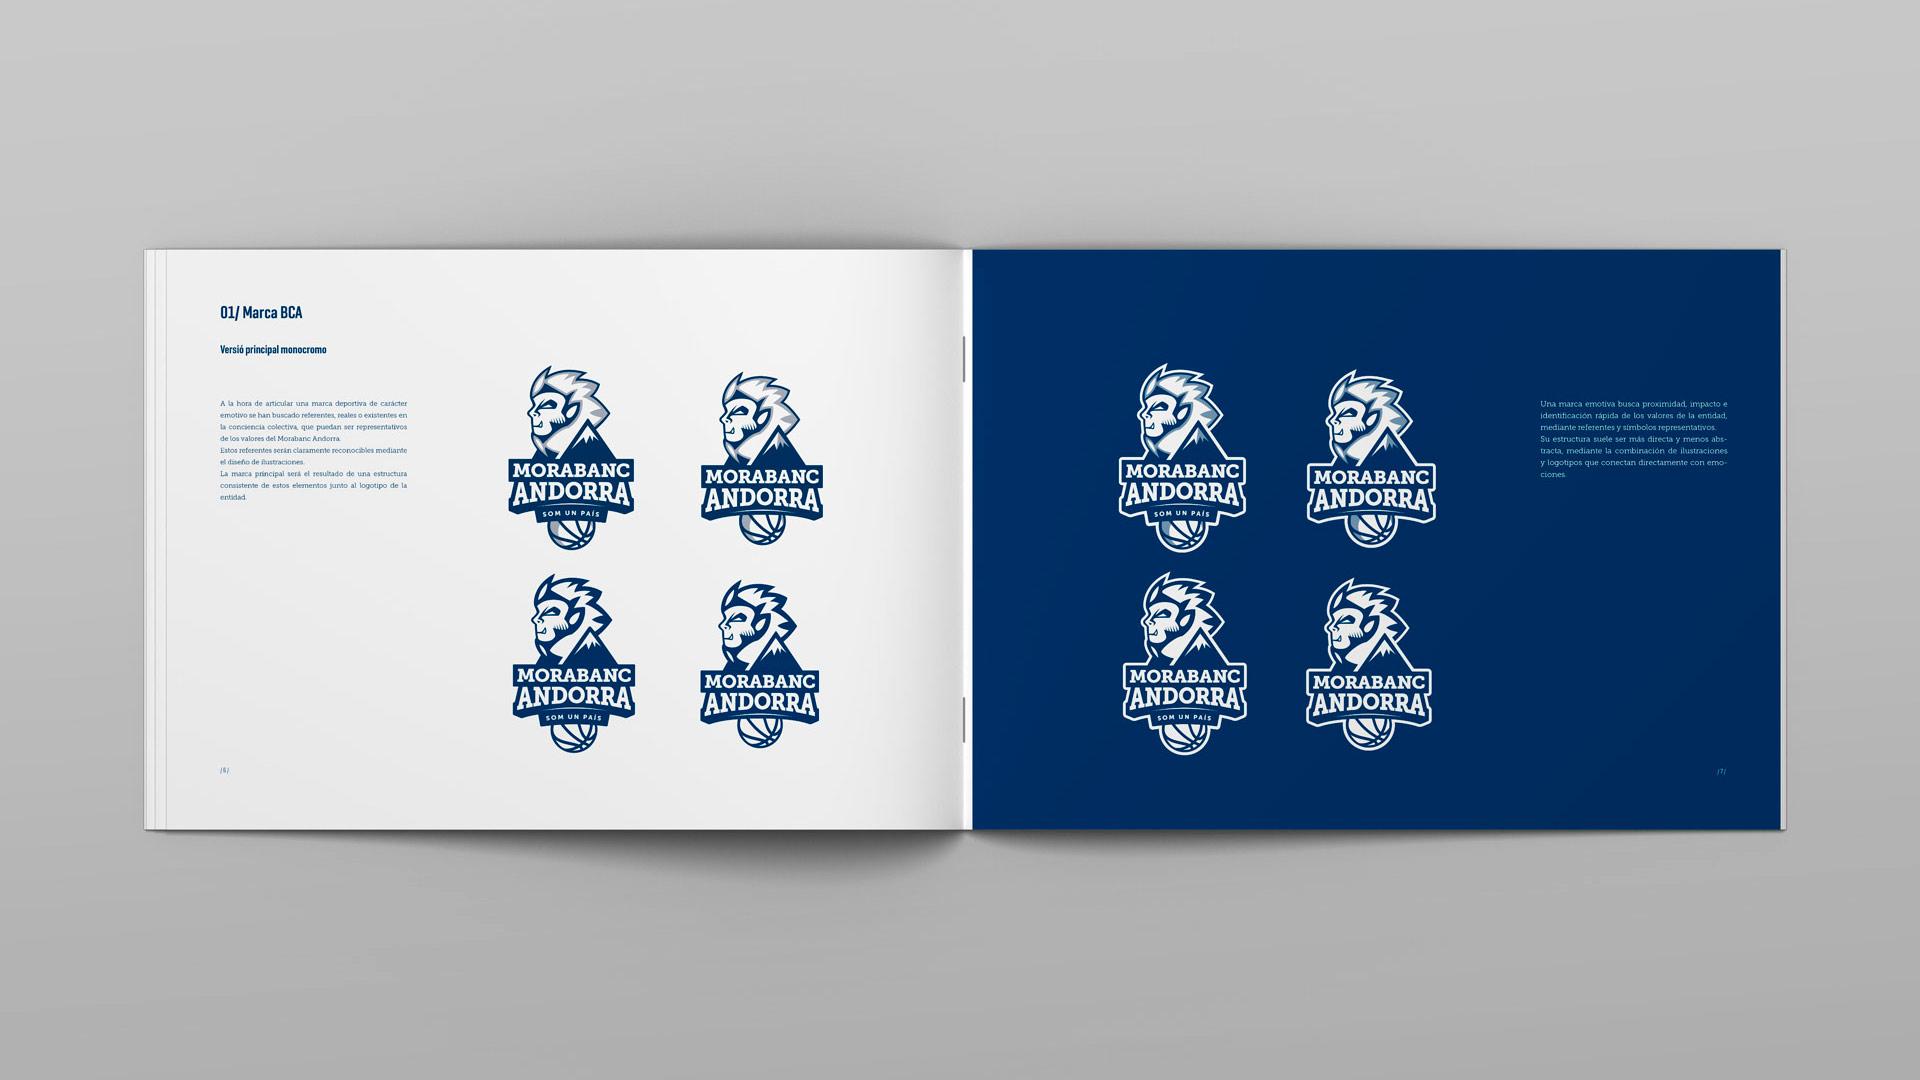 Rediseño Marca e Identidad Corporativa Morabanc Andorra - Manual